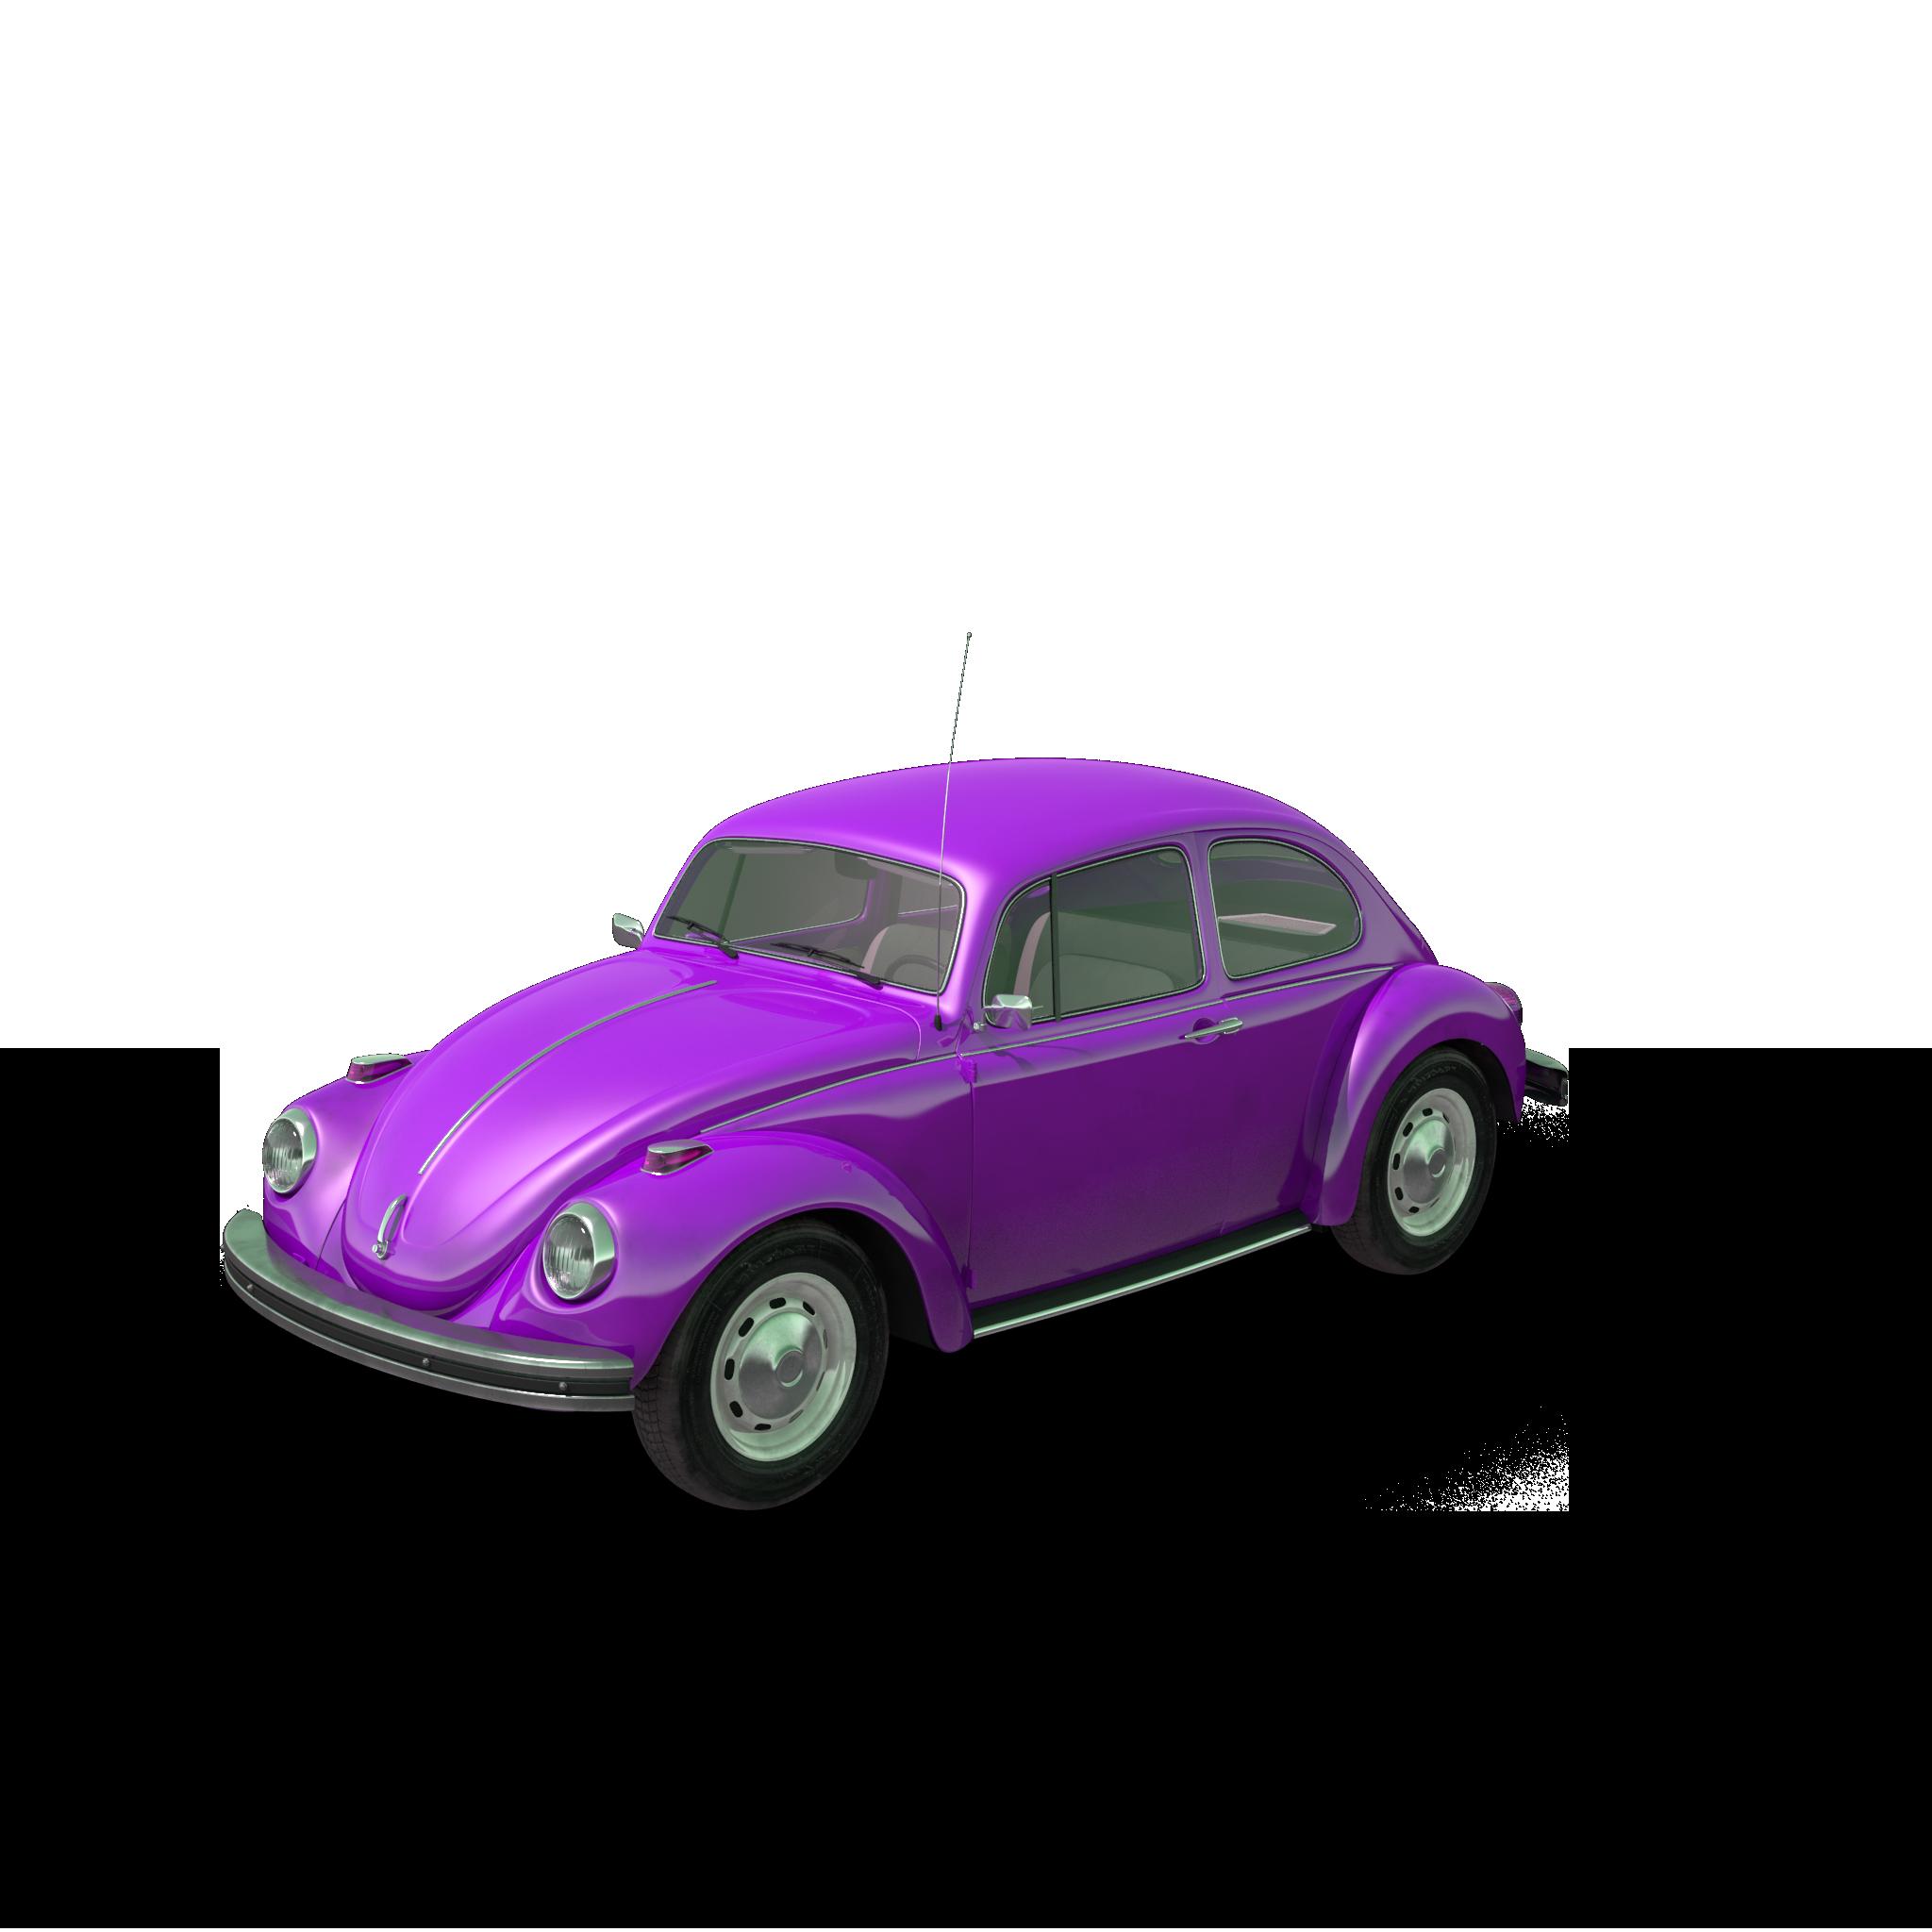 Should I invest in Volkswagen?